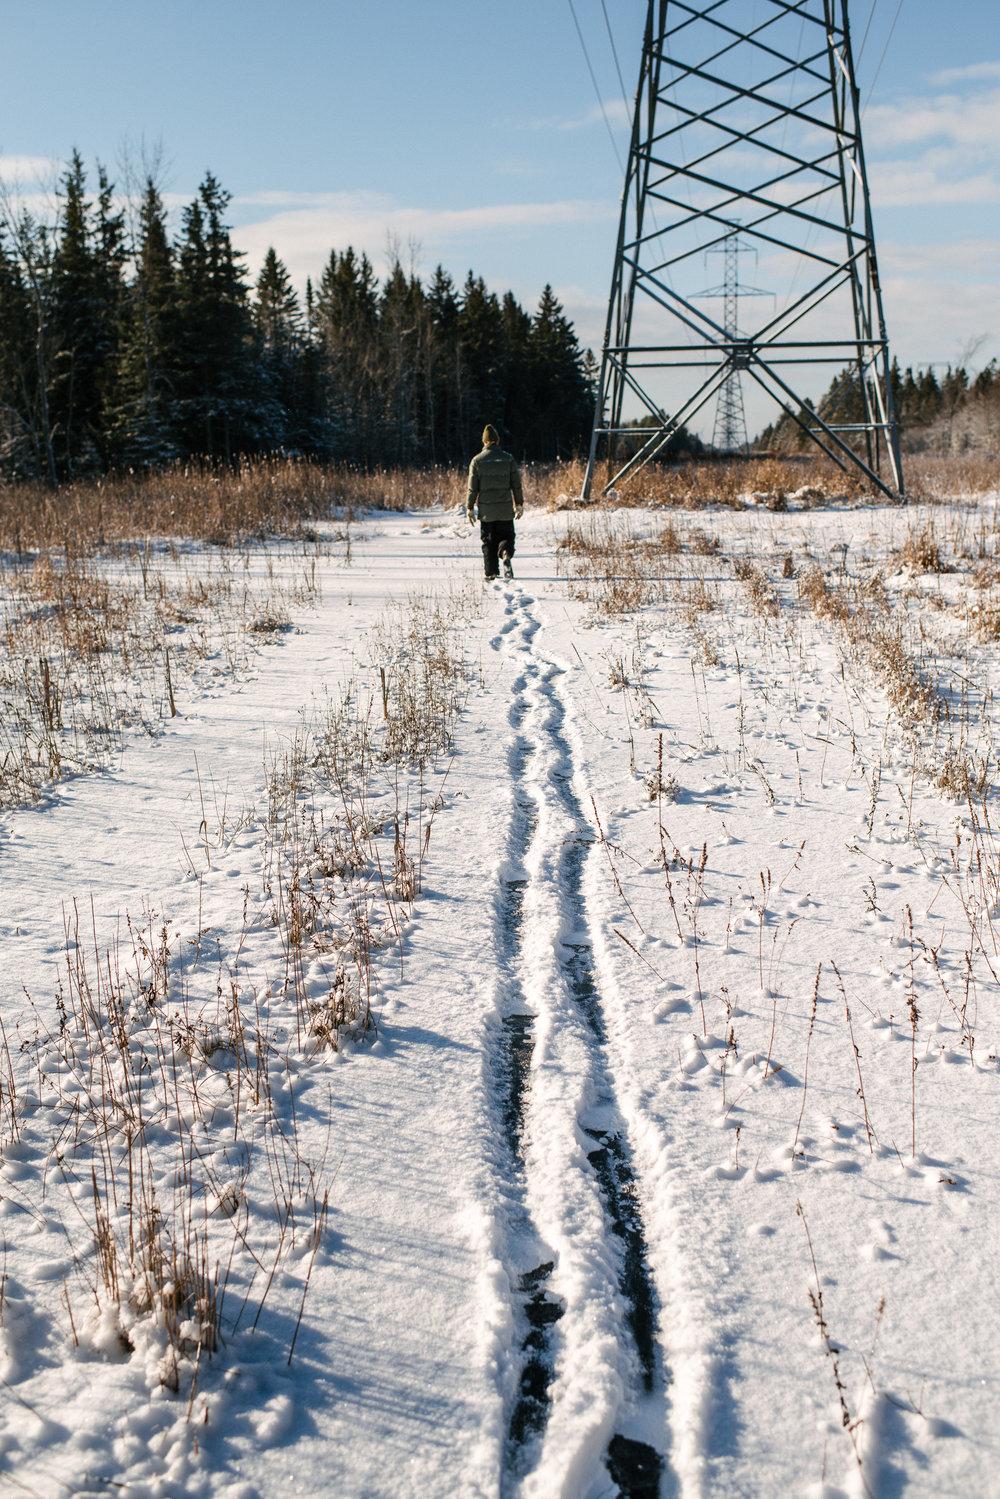 winter documentary photography viara mileva-110938vm.jpg